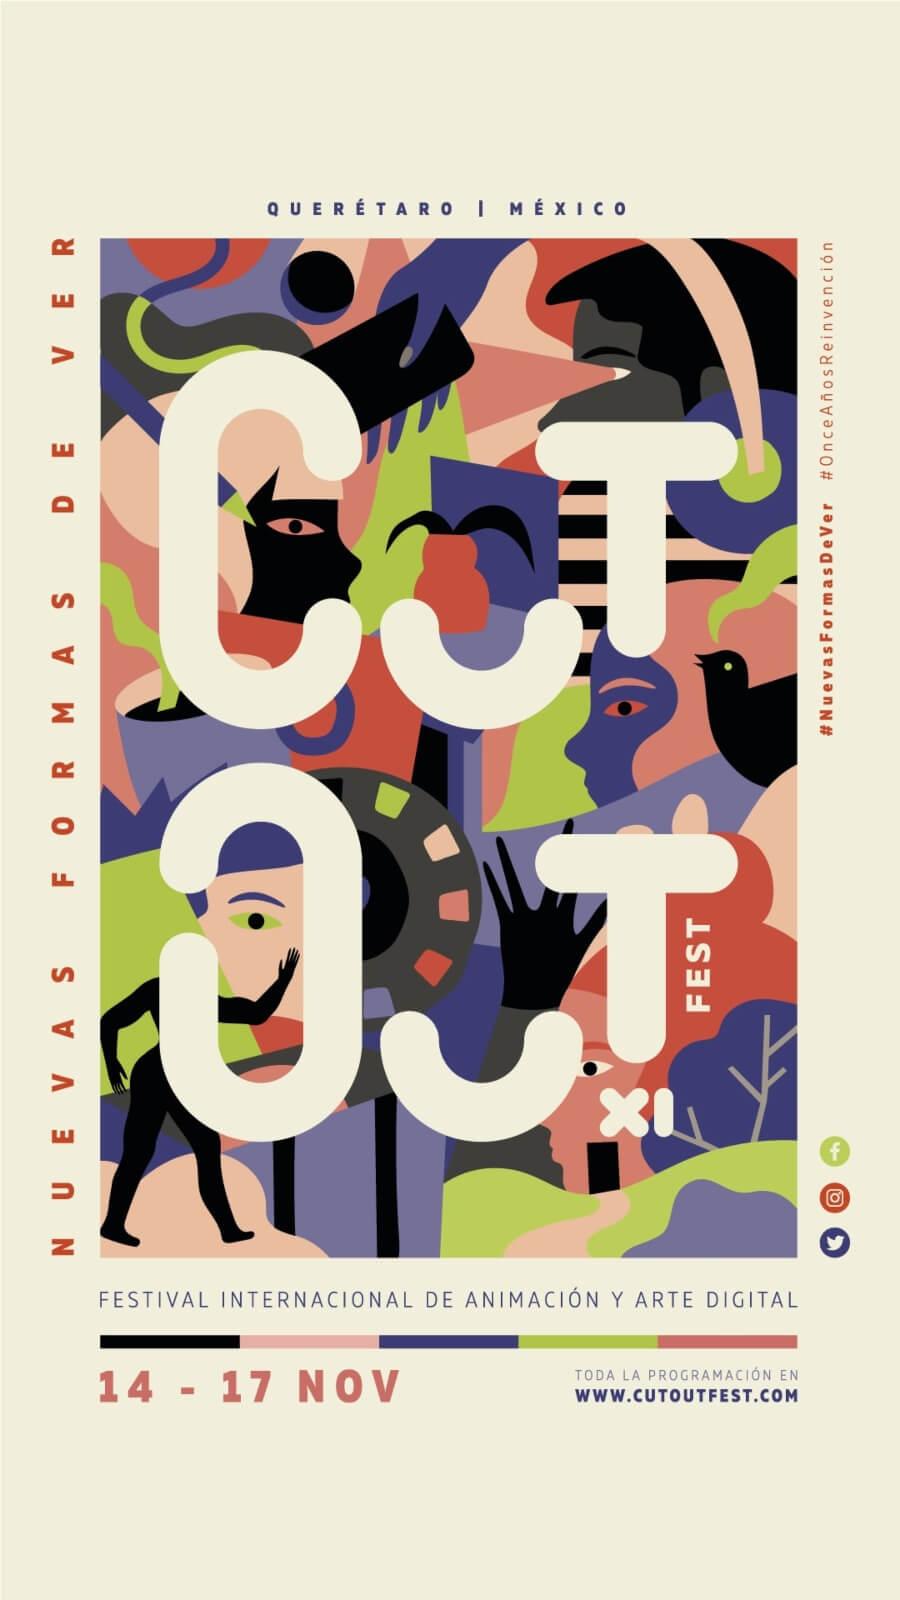 Cut Out Fest se llevrá a cabo del 14 al 17 de noviembre